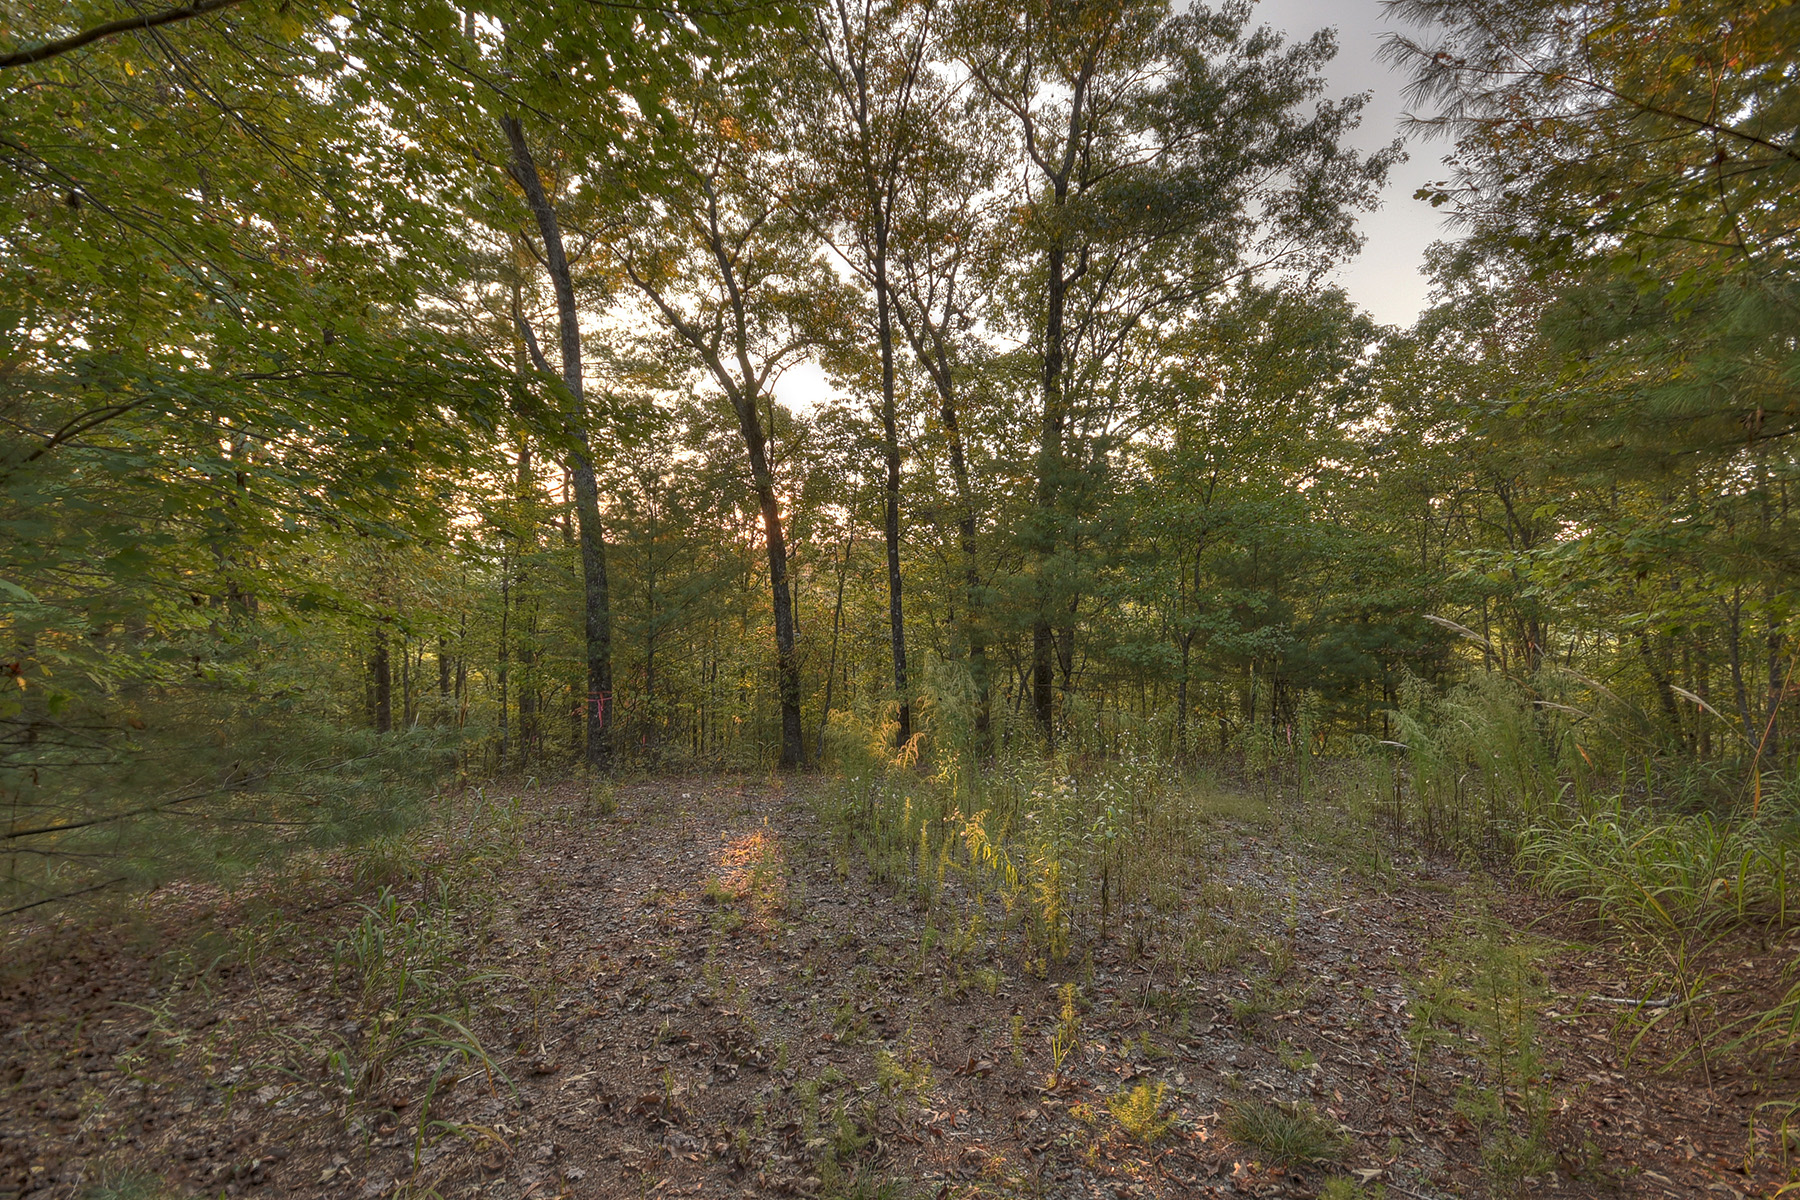 Земля для того Продажа на River Front Lot on Mighty Toccoa River in North Georgia Lot 84 Coldwater Creek Dr, Mineral Bluff, Джорджия 30559 Соединенные Штаты